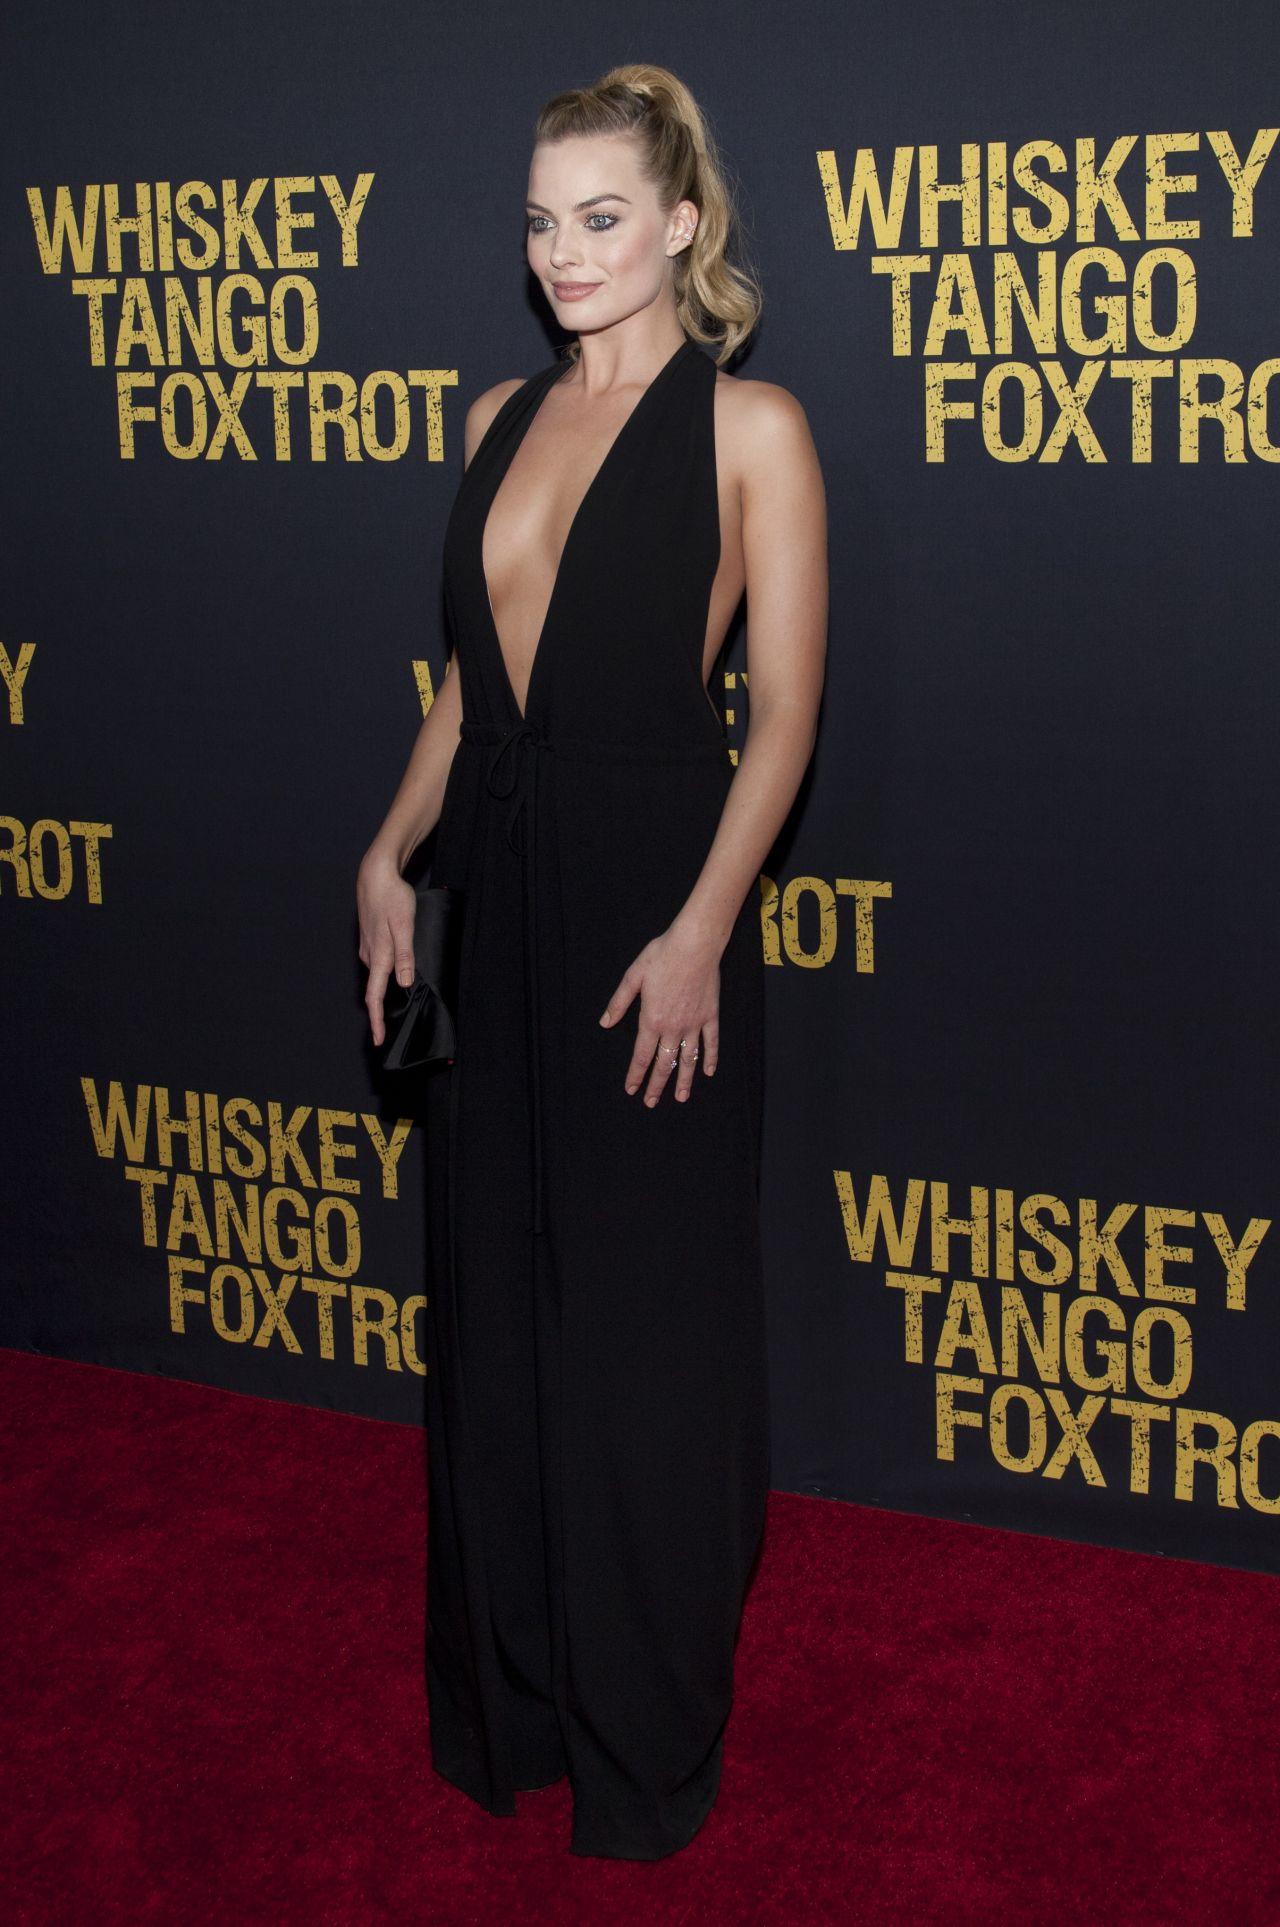 Margot Robbie Whiskey Tango Foxtrot Premiere In New